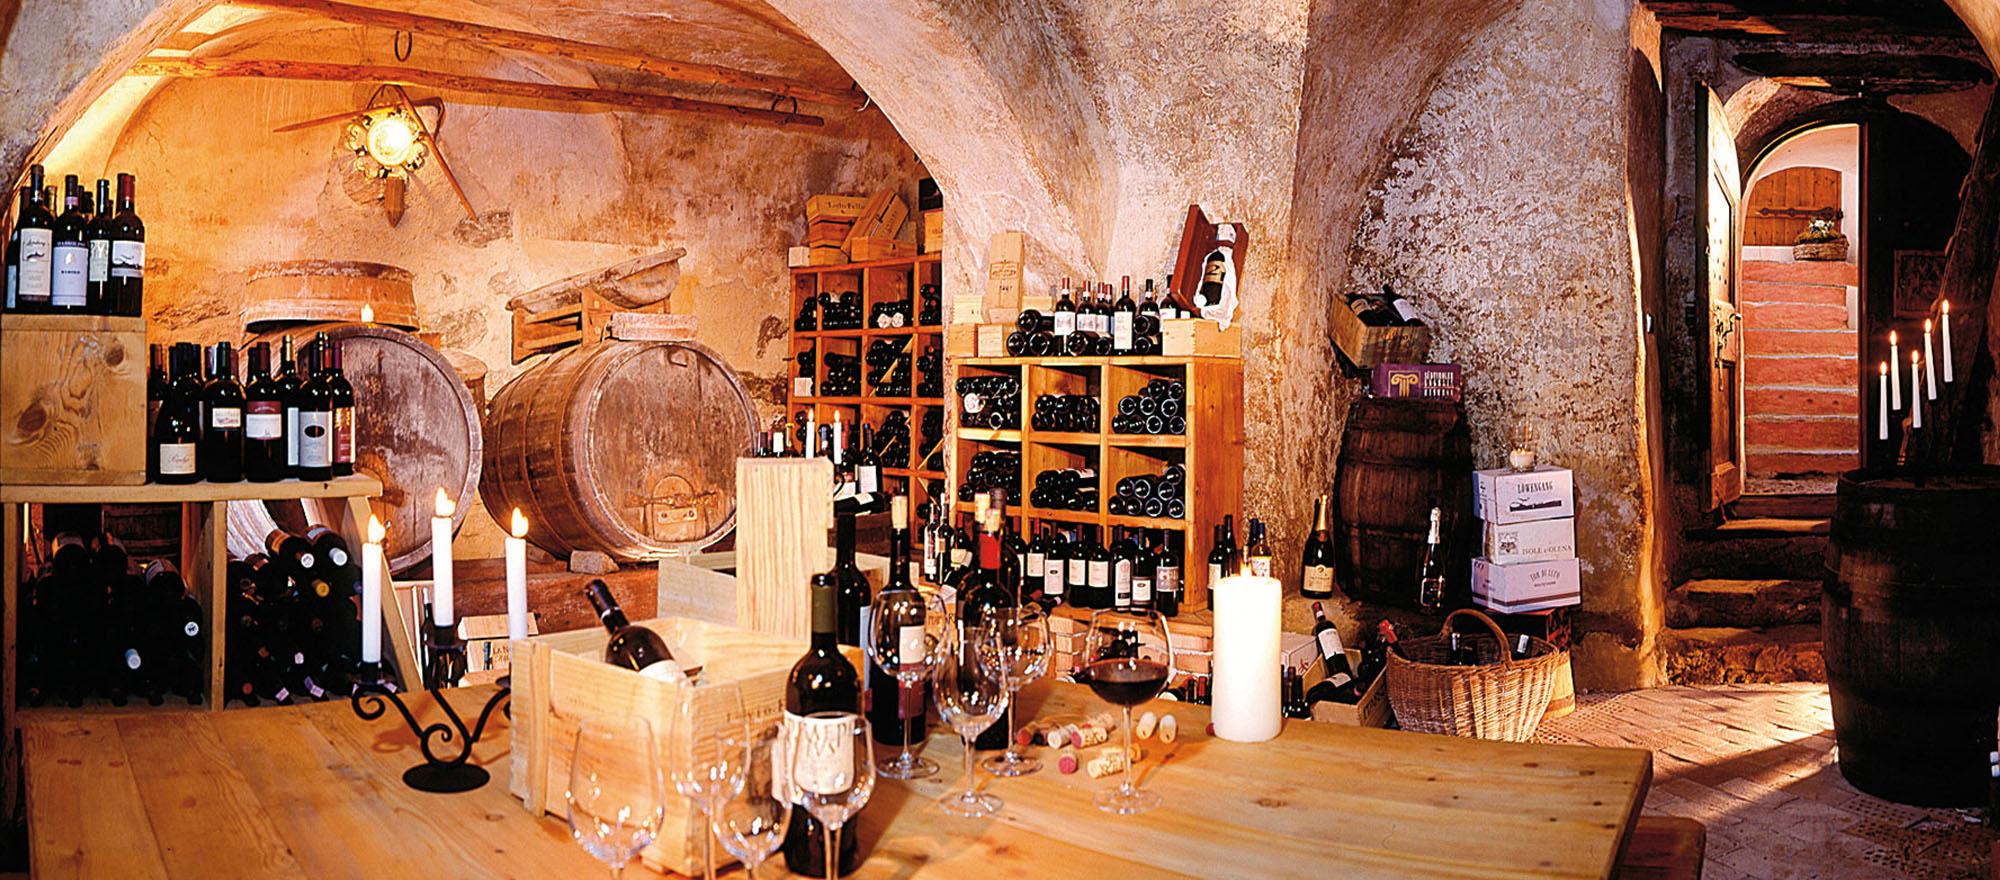 Mein Matillhof in Alto Adige